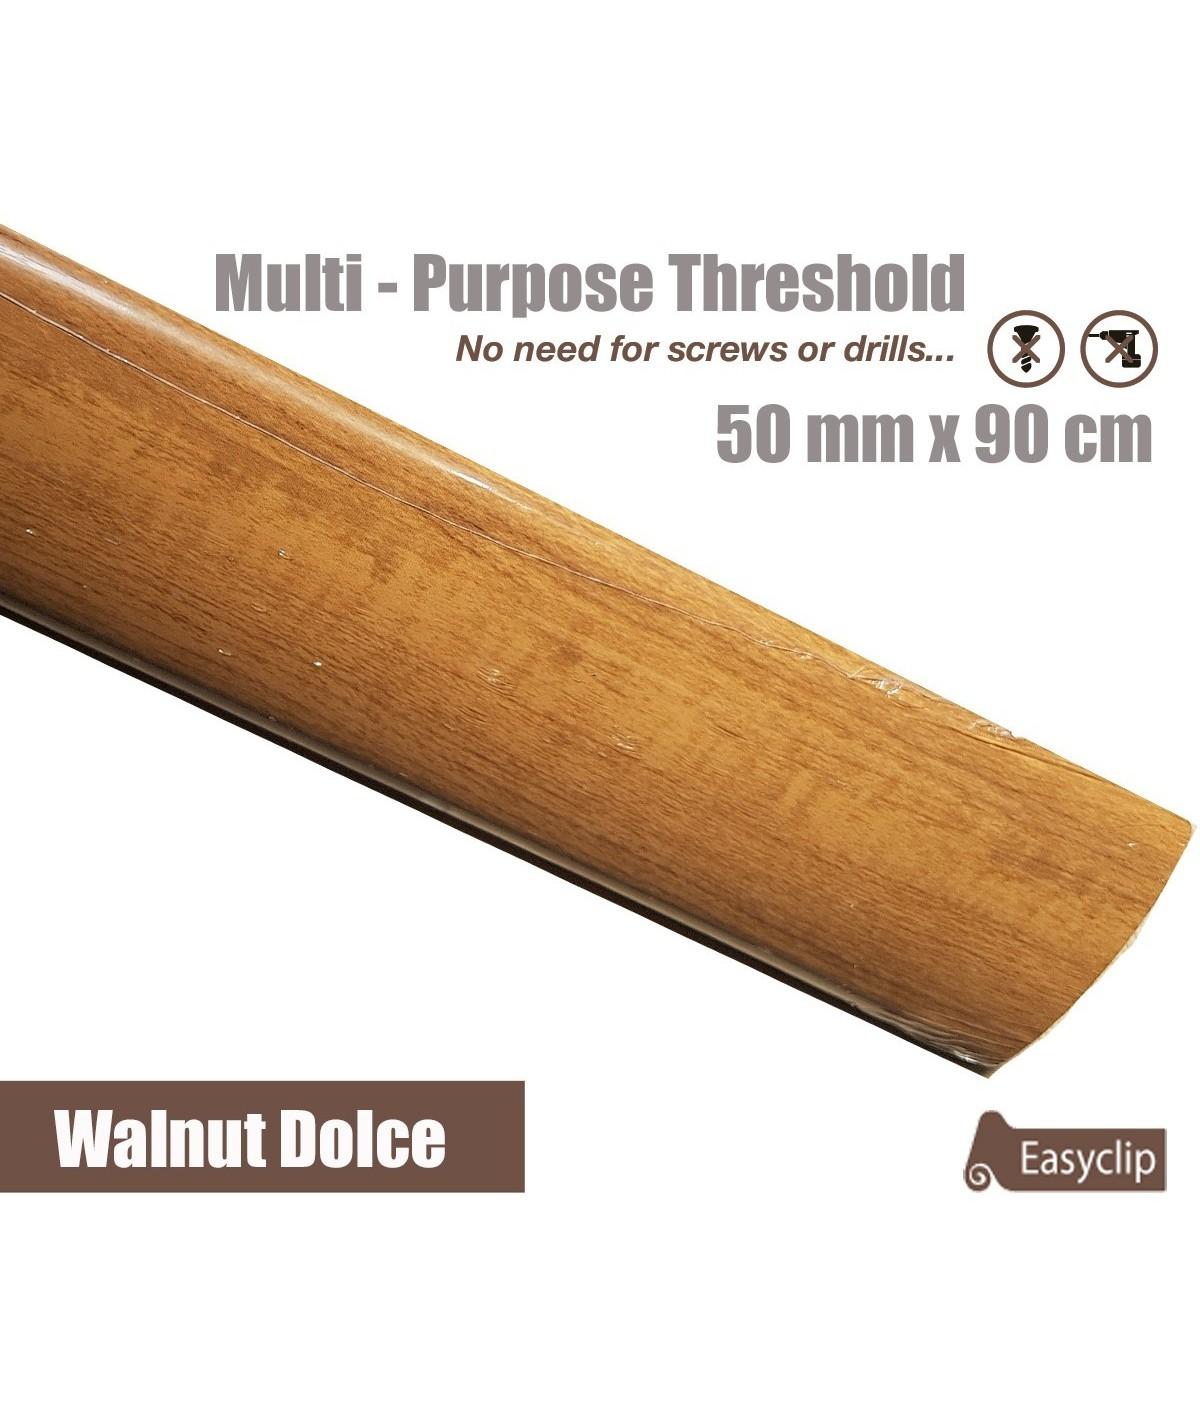 Walnut Dolce Transition Threshold Strip  50mm x 90cm Multi-Height/Pivots